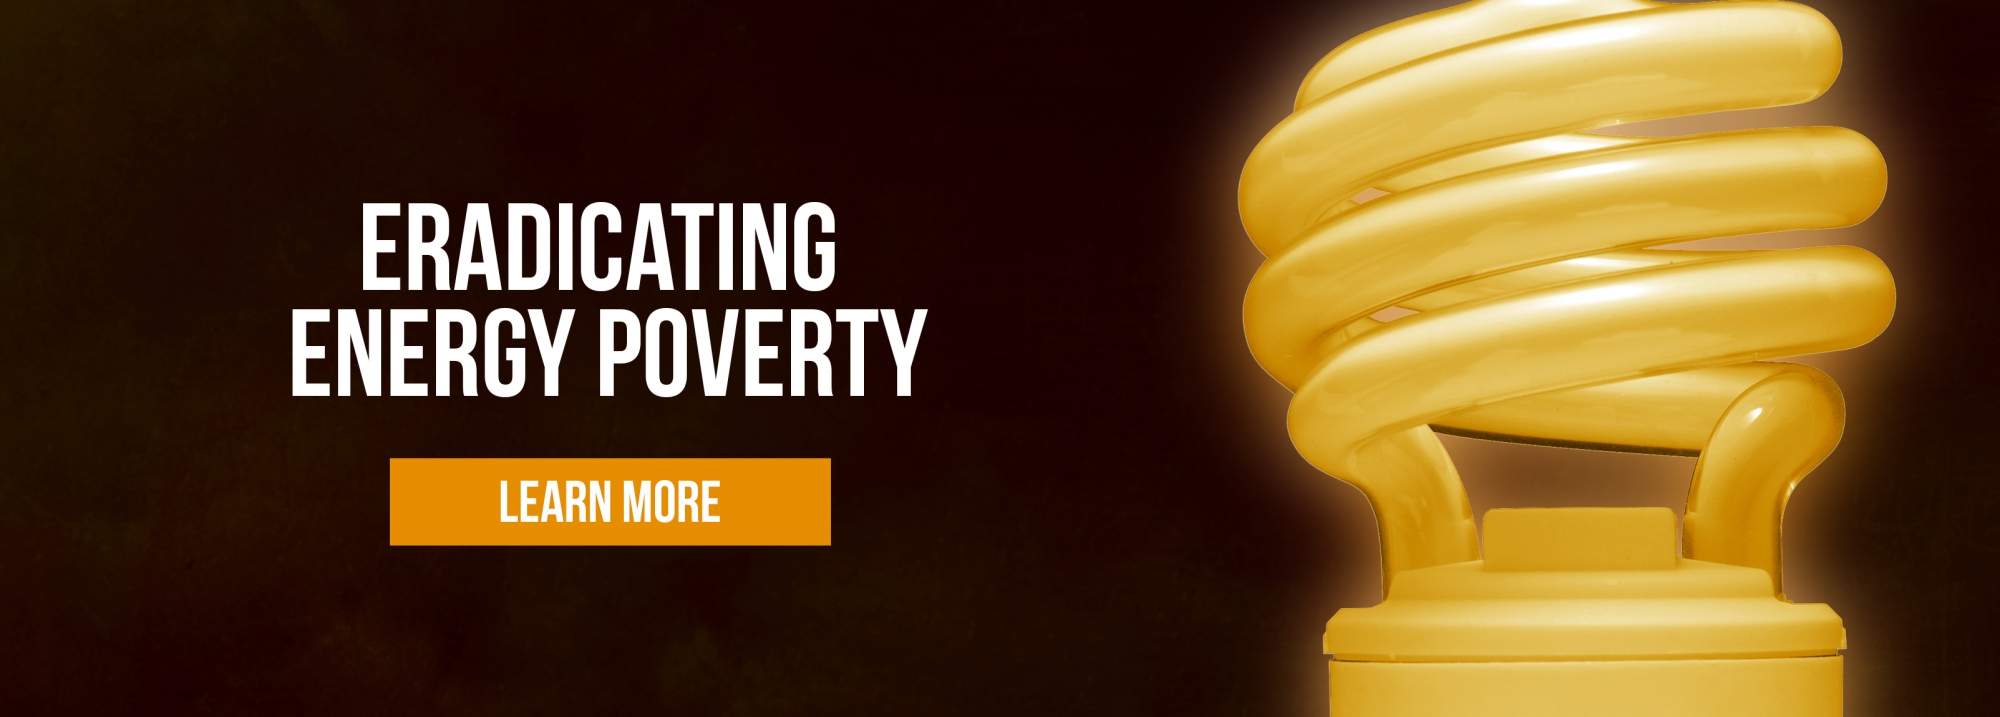 Eradicating energy poverty